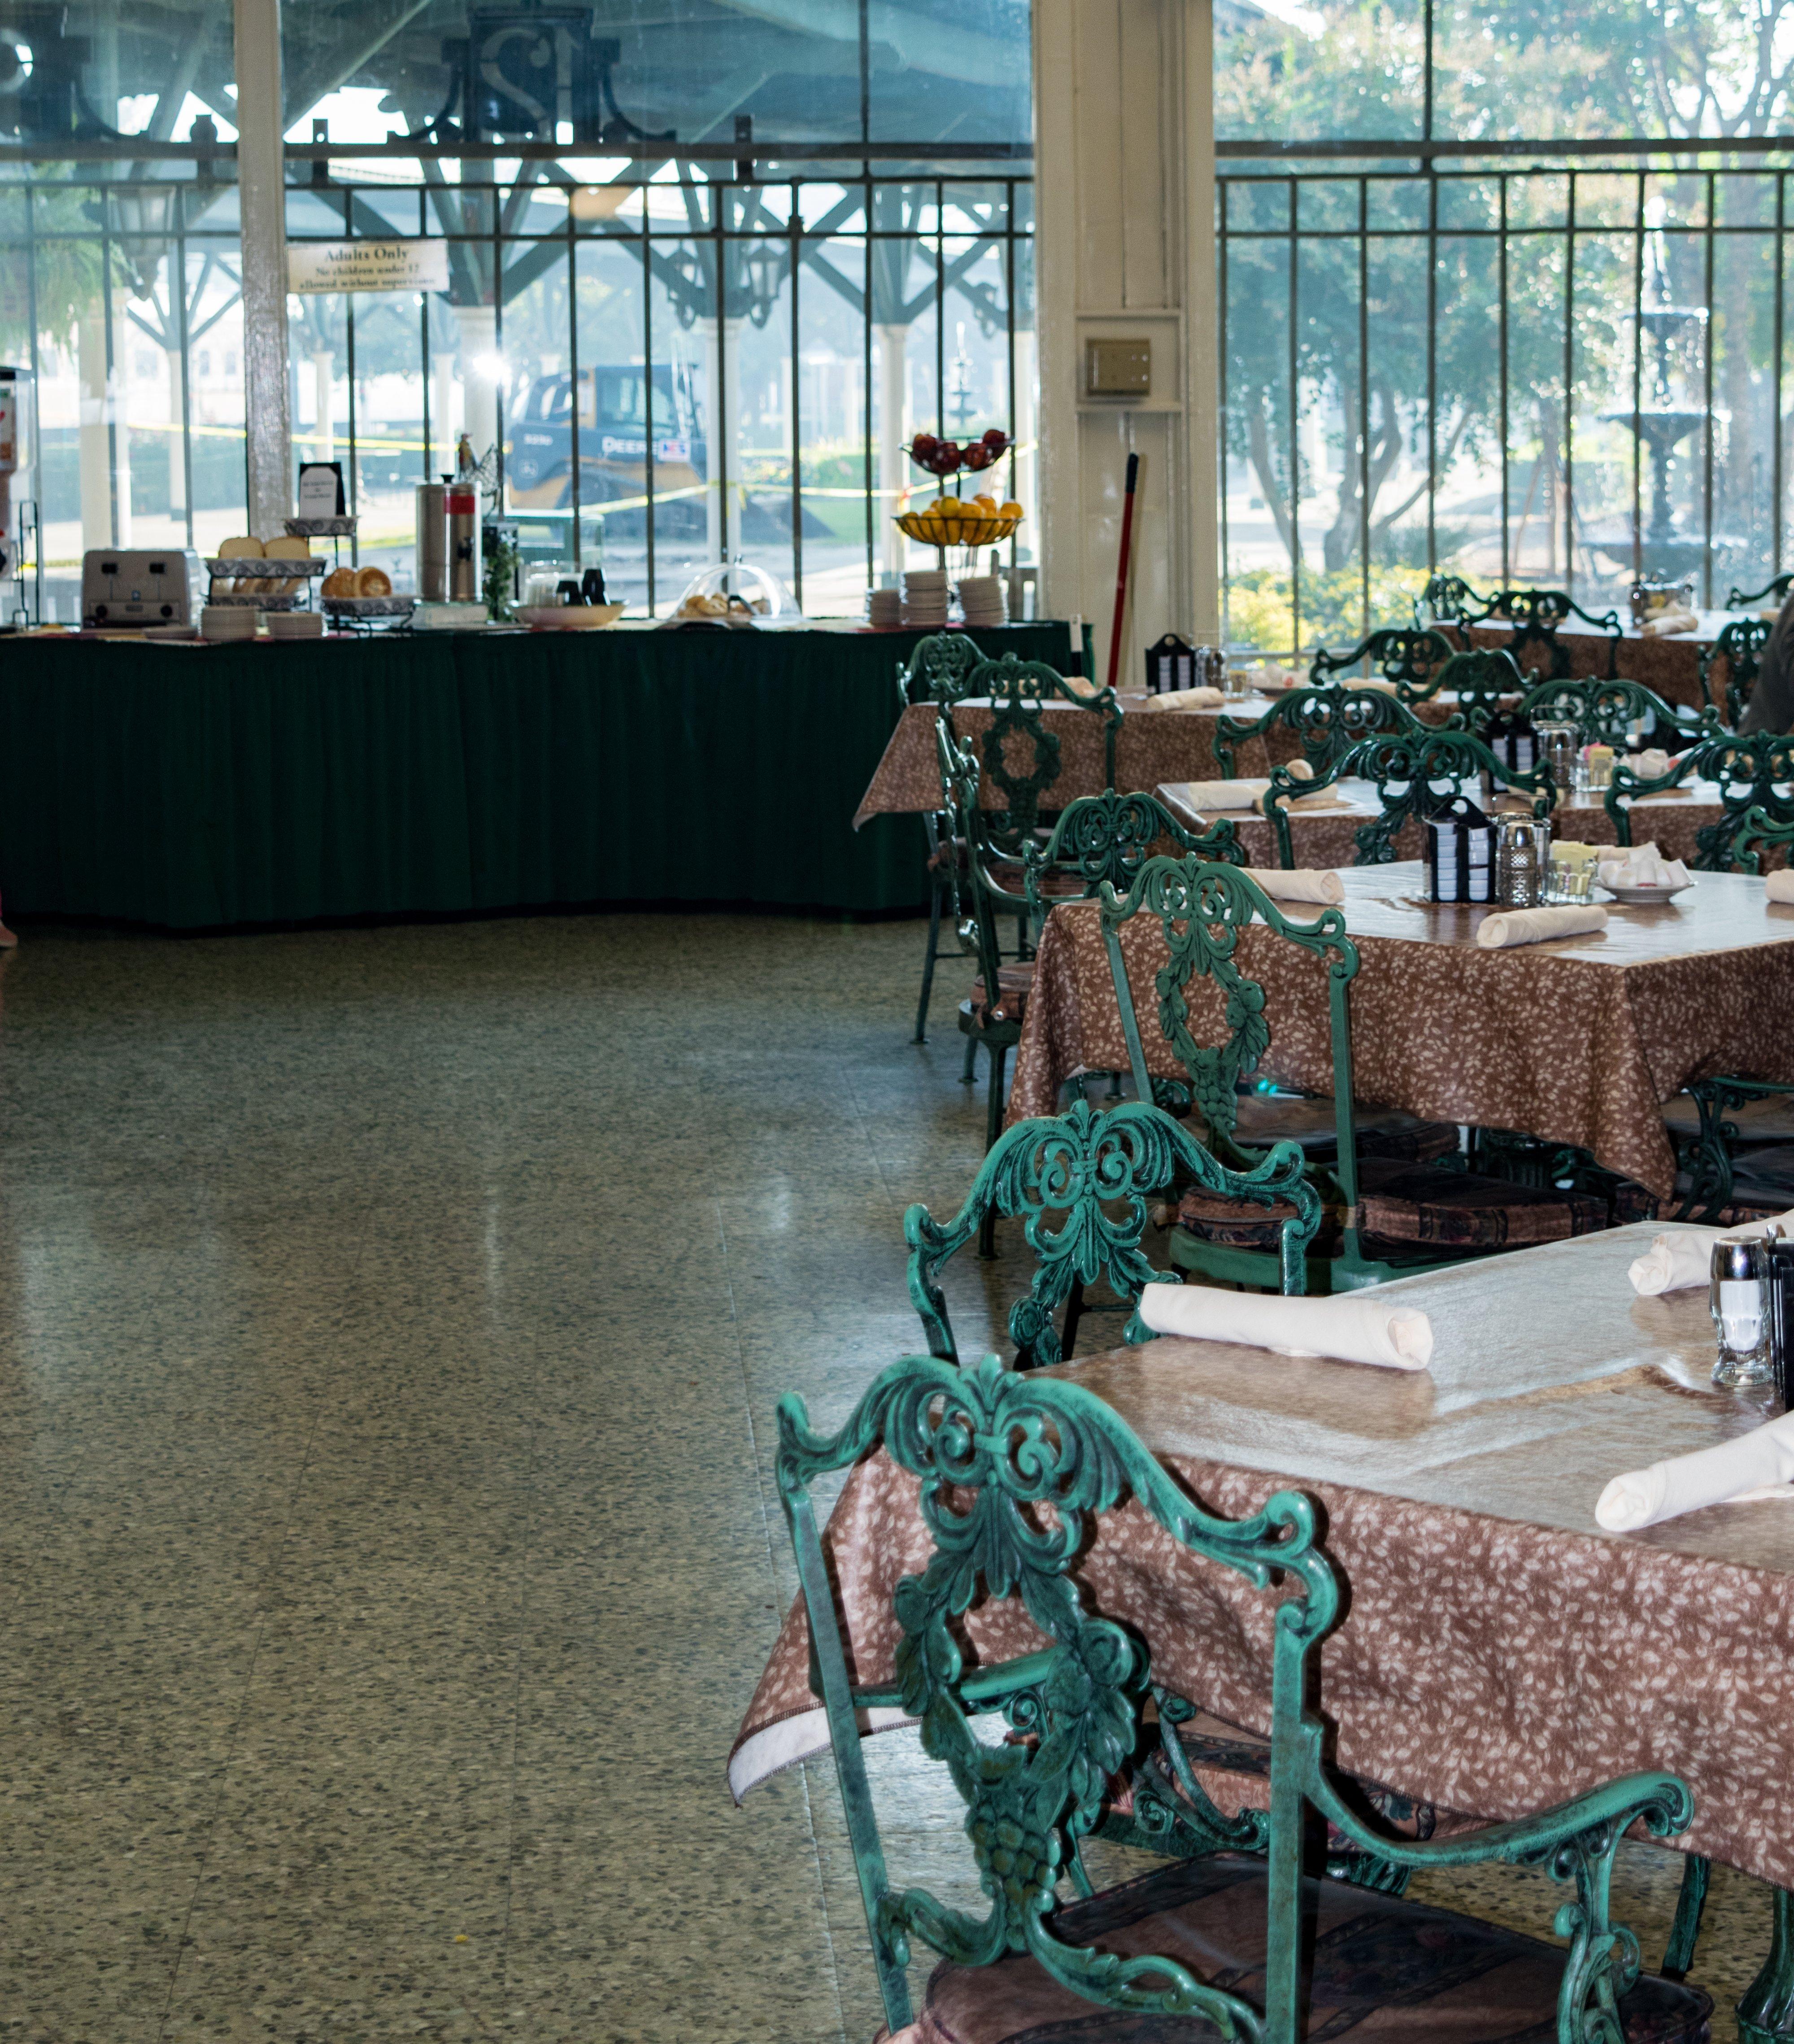 The Garden Restaurant Dining Room Chattanooga Choo Choo Hotel